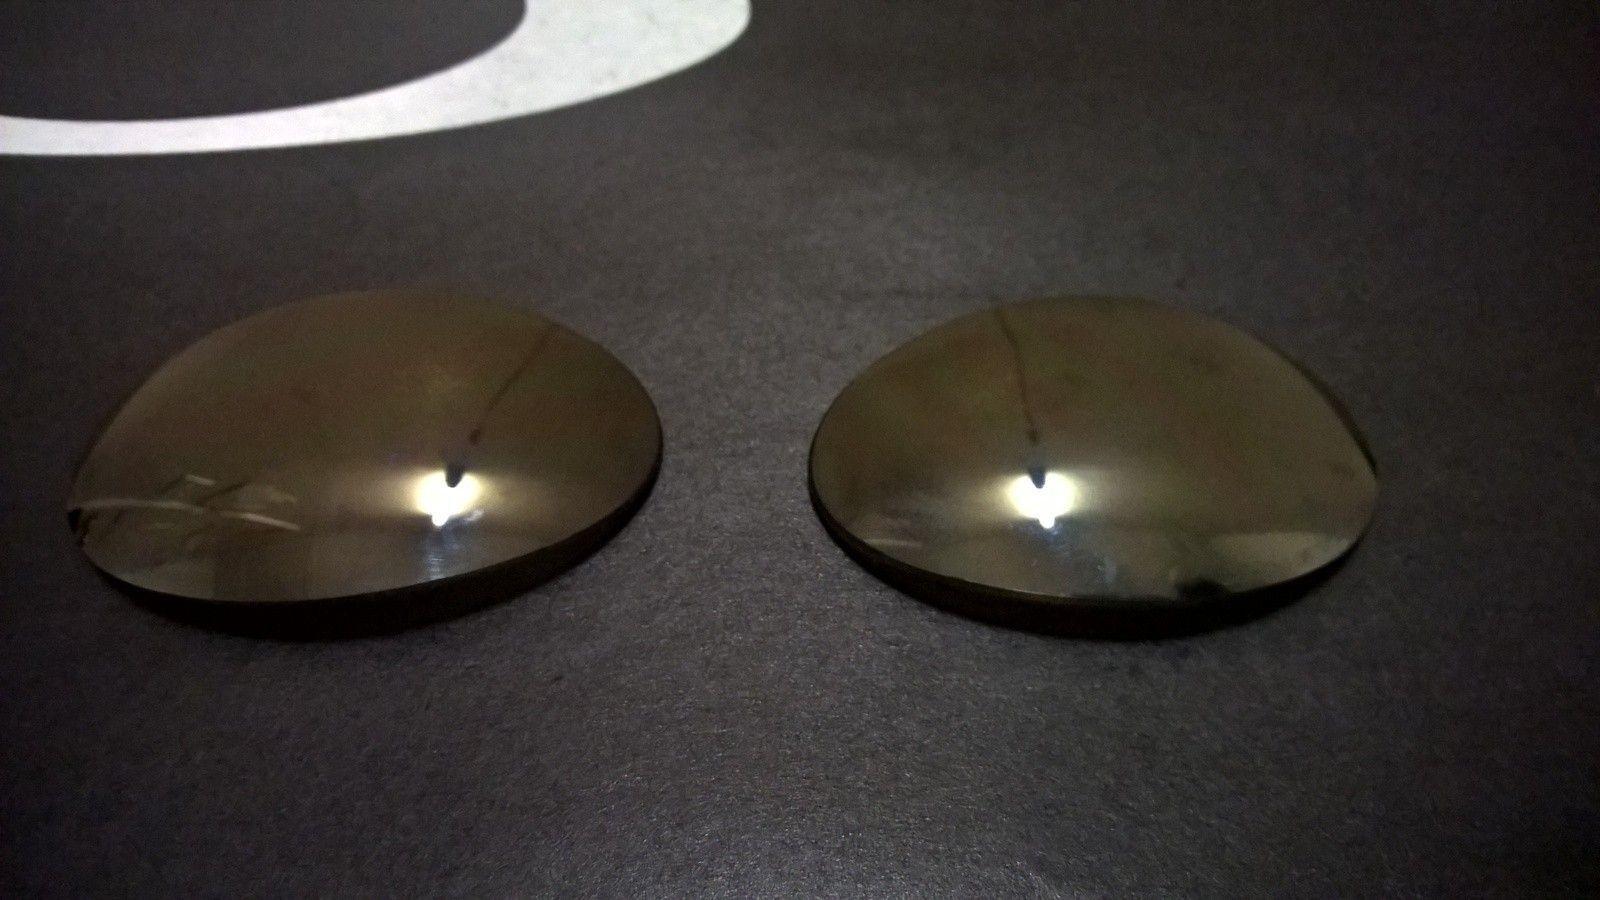 Romeo 1 Gold Iridium Lenses / Box / Rubbers - WP_20150312_01_41_46_Pro.jpg